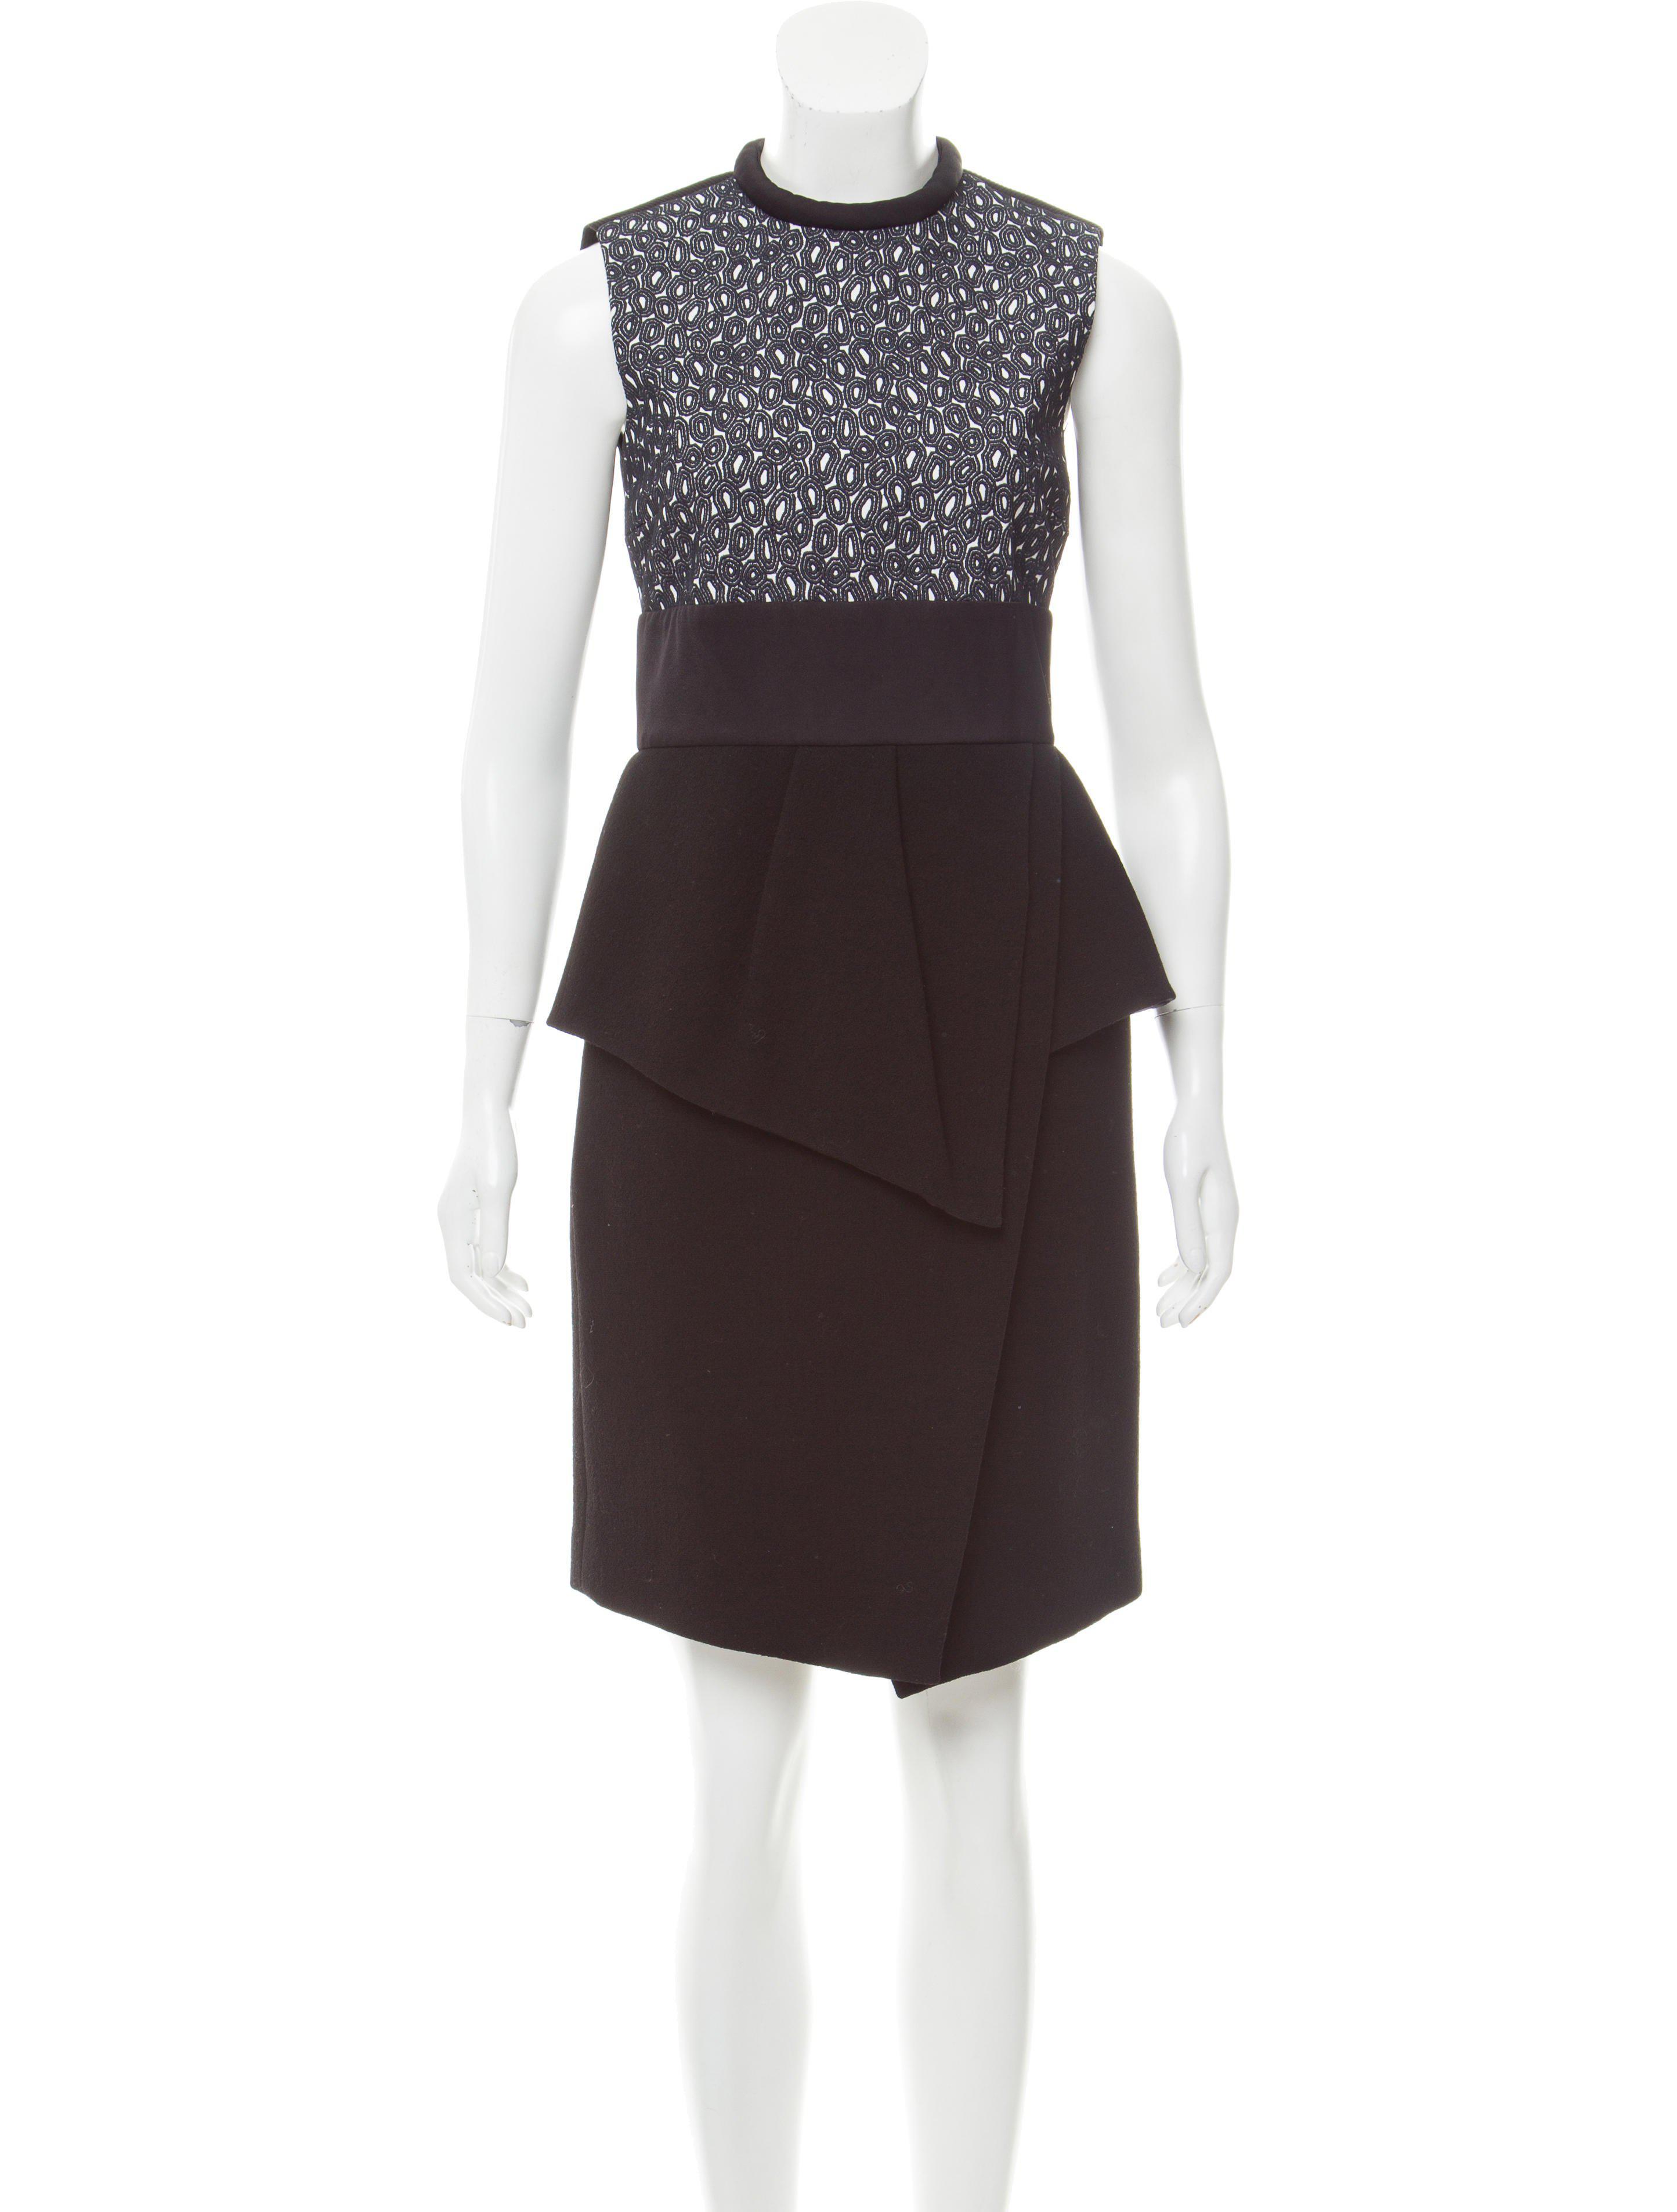 DRESSES - Knee-length dresses Proenza Schouler 4pJmidj